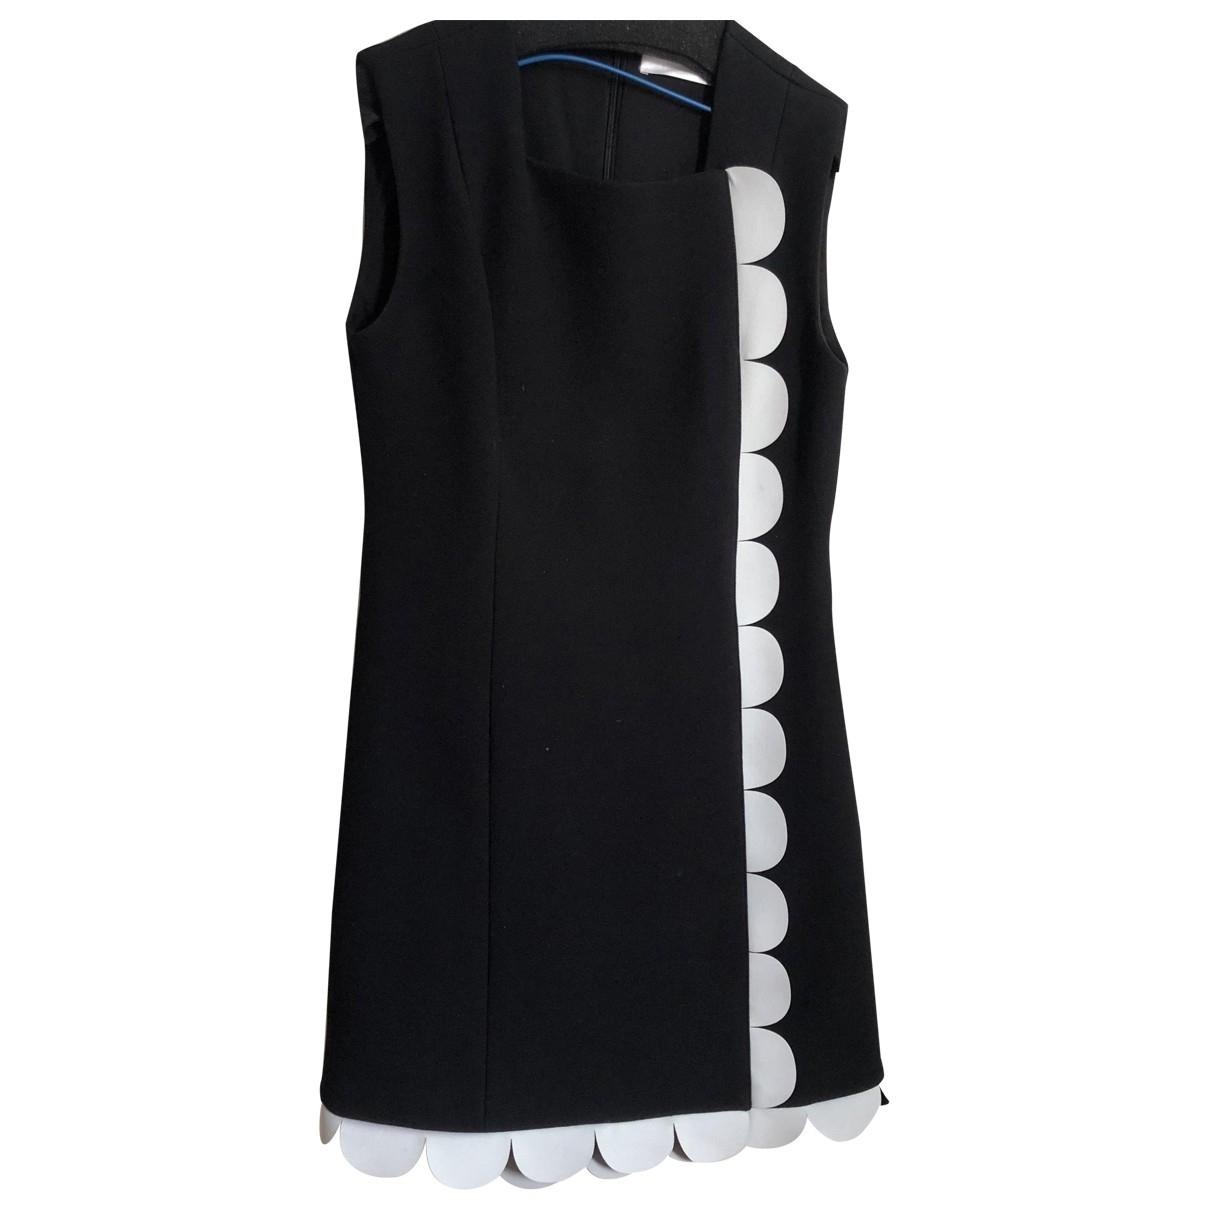 Victoria, Victoria Beckham \N Black dress for Women 36 FR